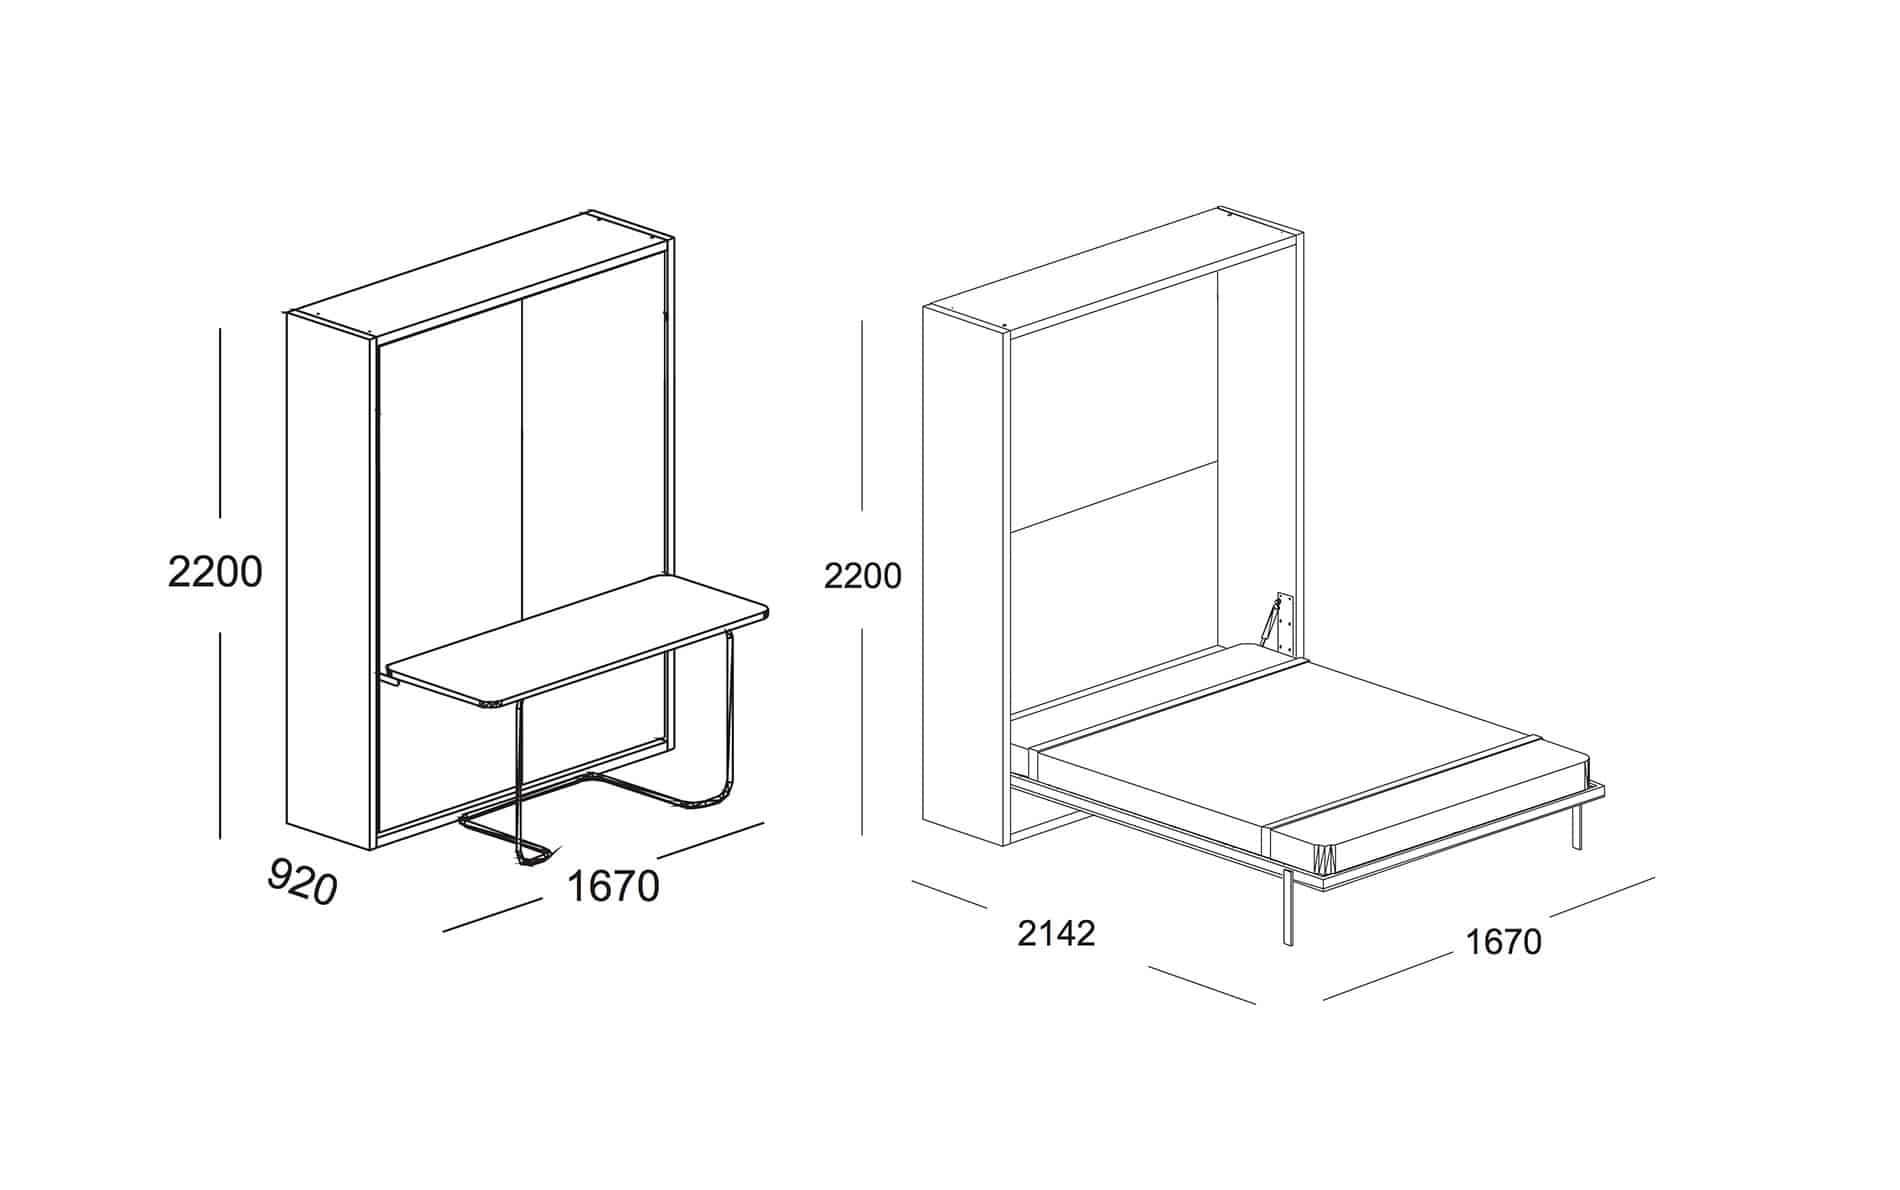 clei ulisse clei m bel wandbetten schrankbetten. Black Bedroom Furniture Sets. Home Design Ideas